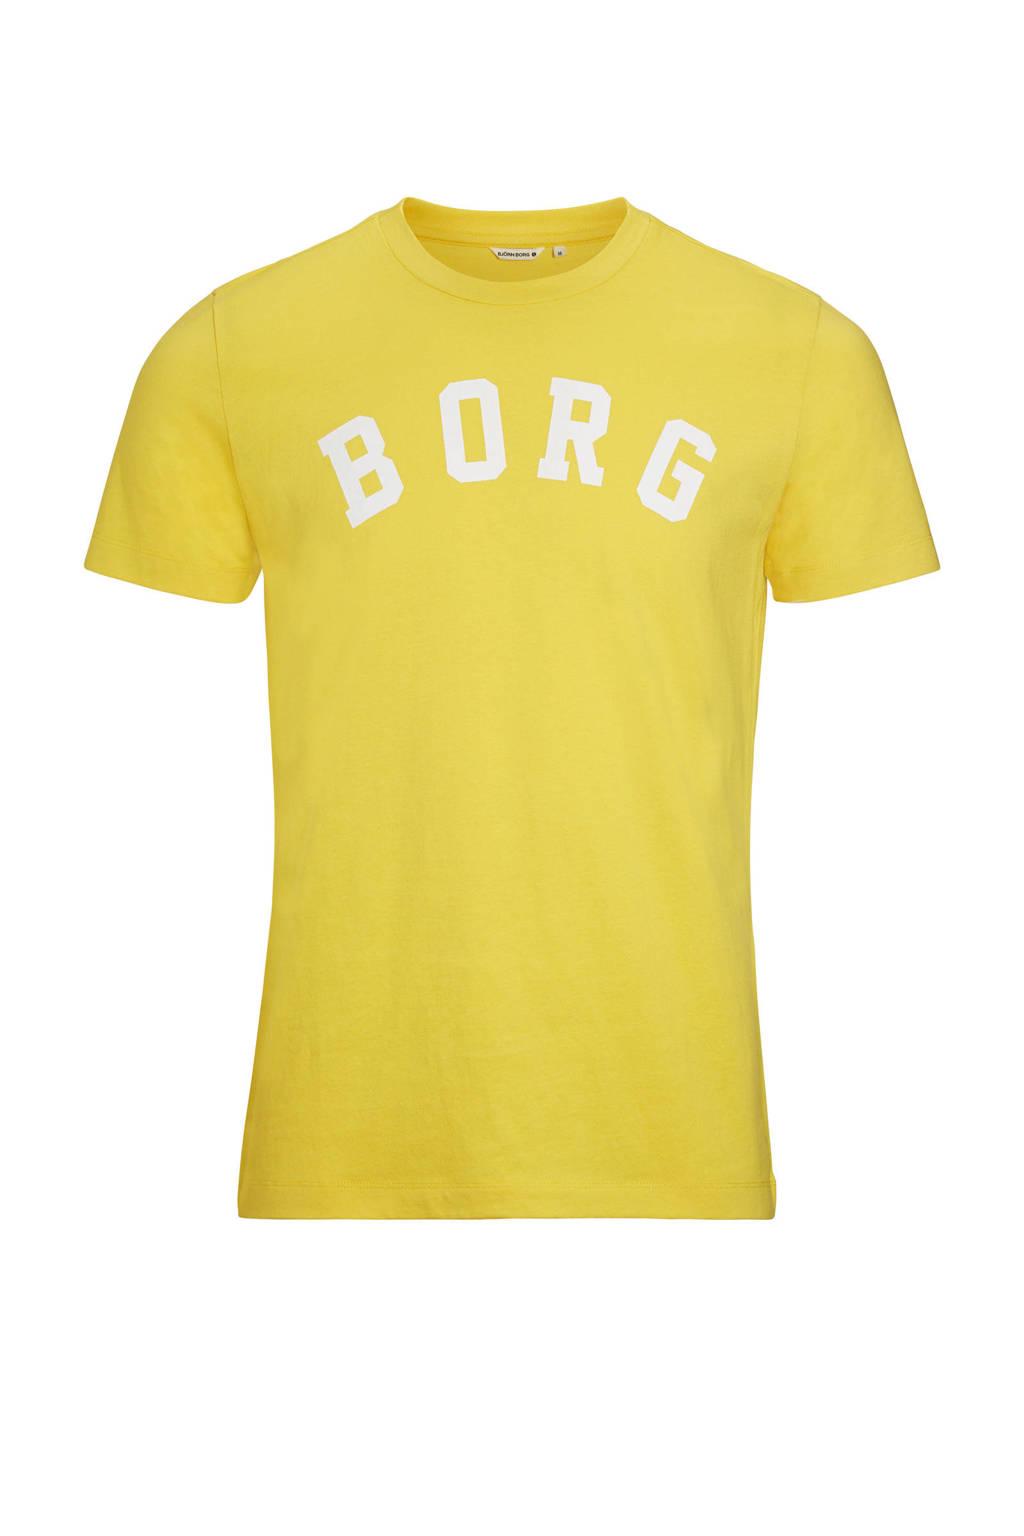 Björn Borg   sport T-shirt geel, Geel/wit